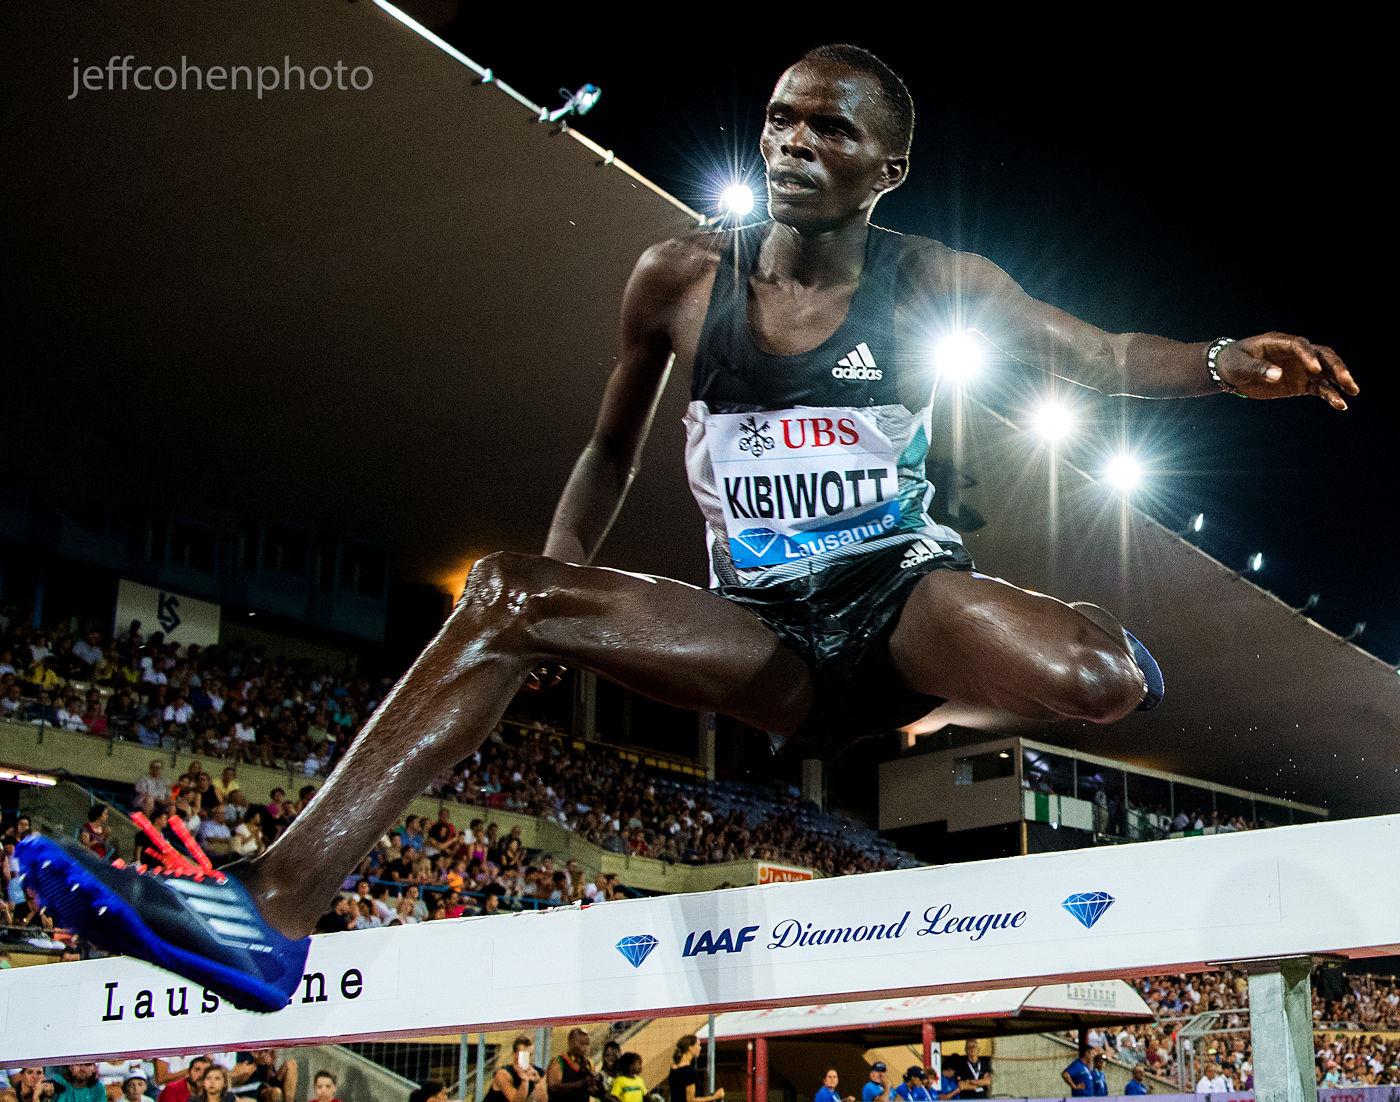 1r2016_athletissima_lausanne_kibiwott_steeple_m_jeff_cohen_photo_214_web.jpg